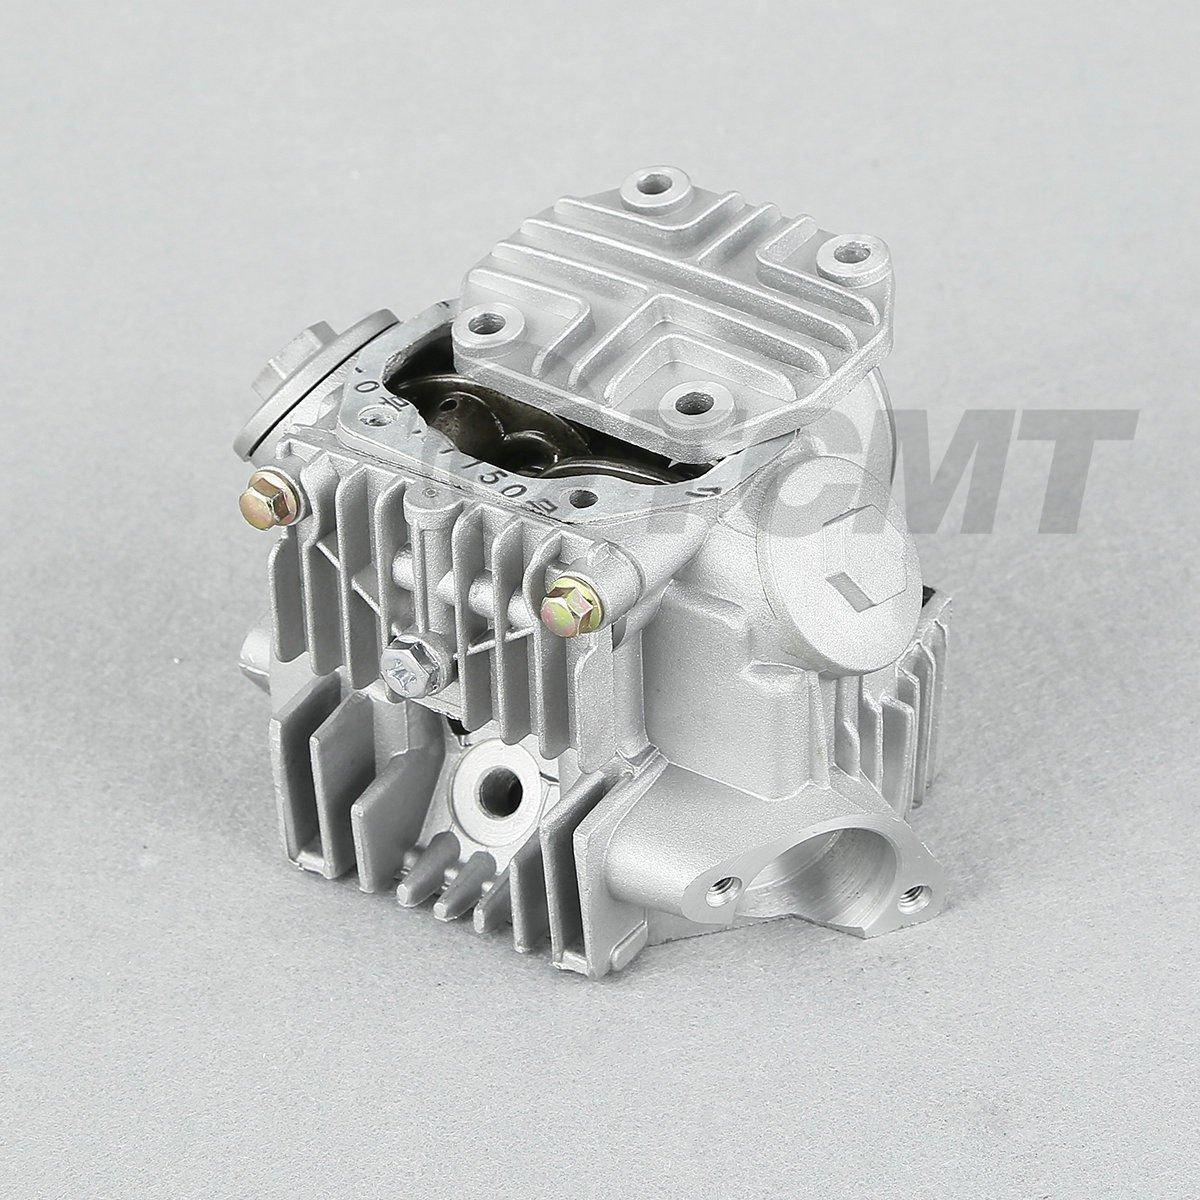 Tcmt Cylinder Engine Rebuild Kit For Honda Atc70 Ct70 1970 Trx70 Crf70 Xr70 70cc Automotive